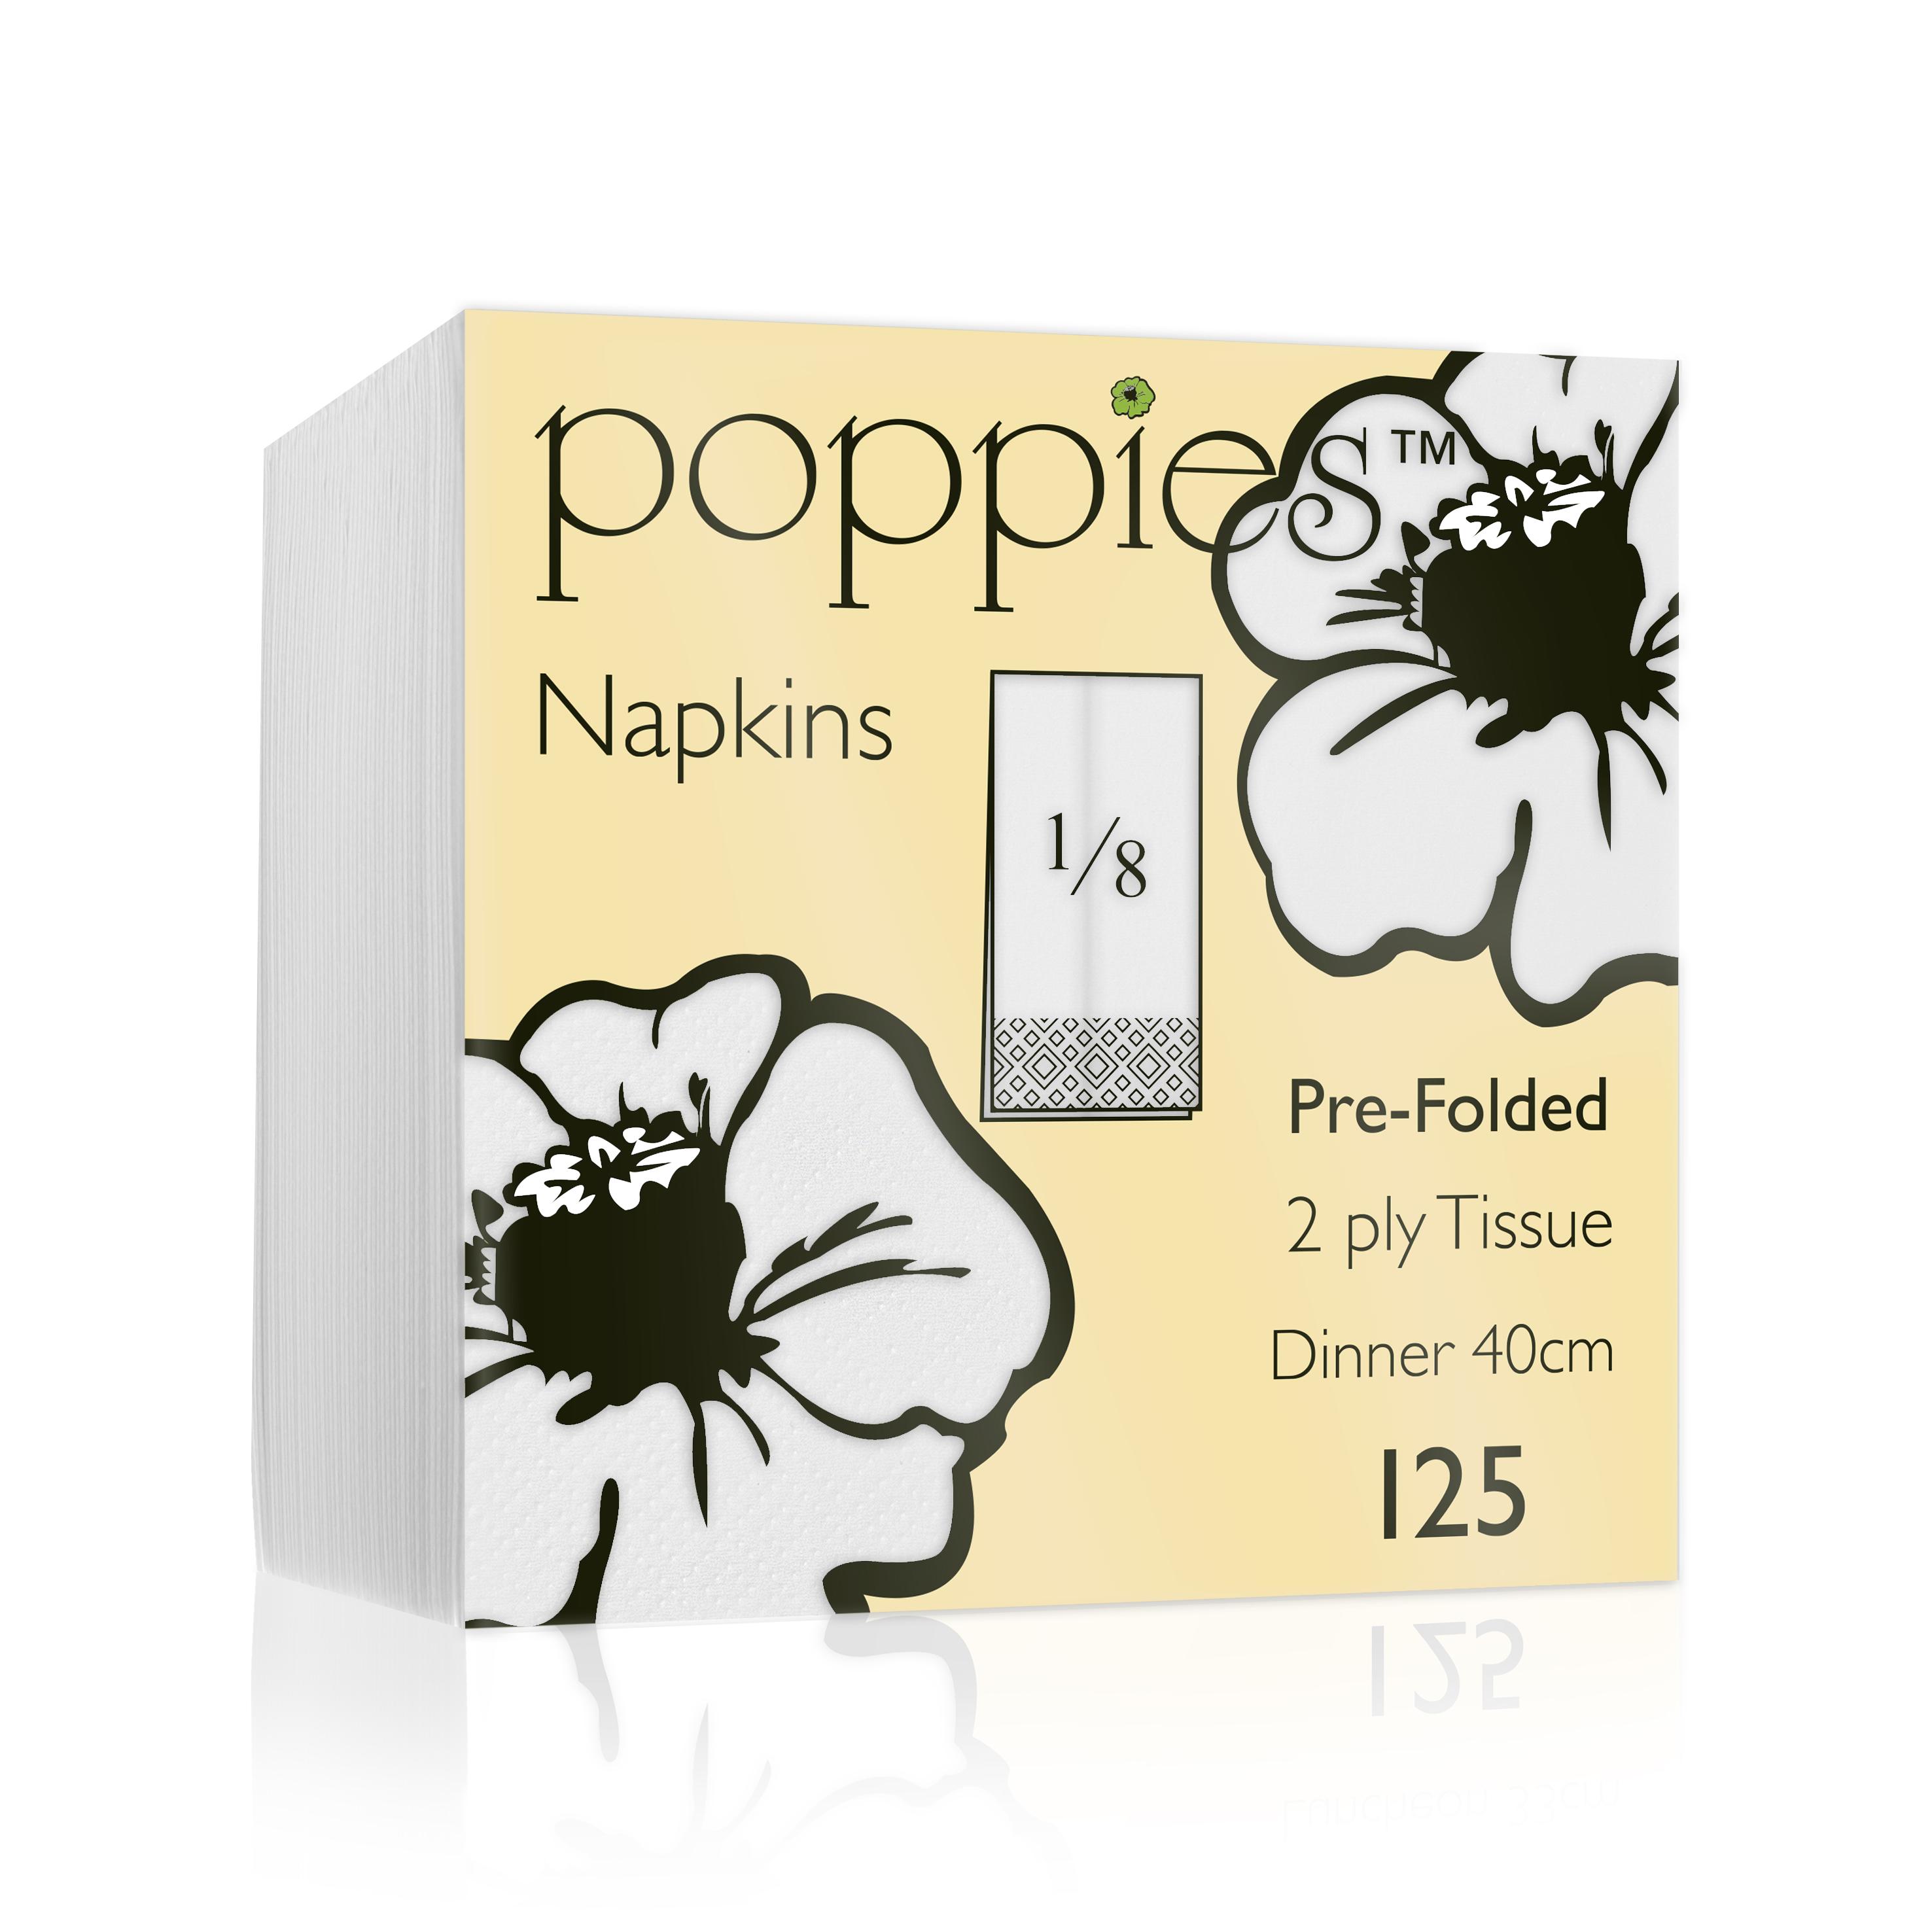 White Napkins 40cm 2ply 8-fold (16x125)